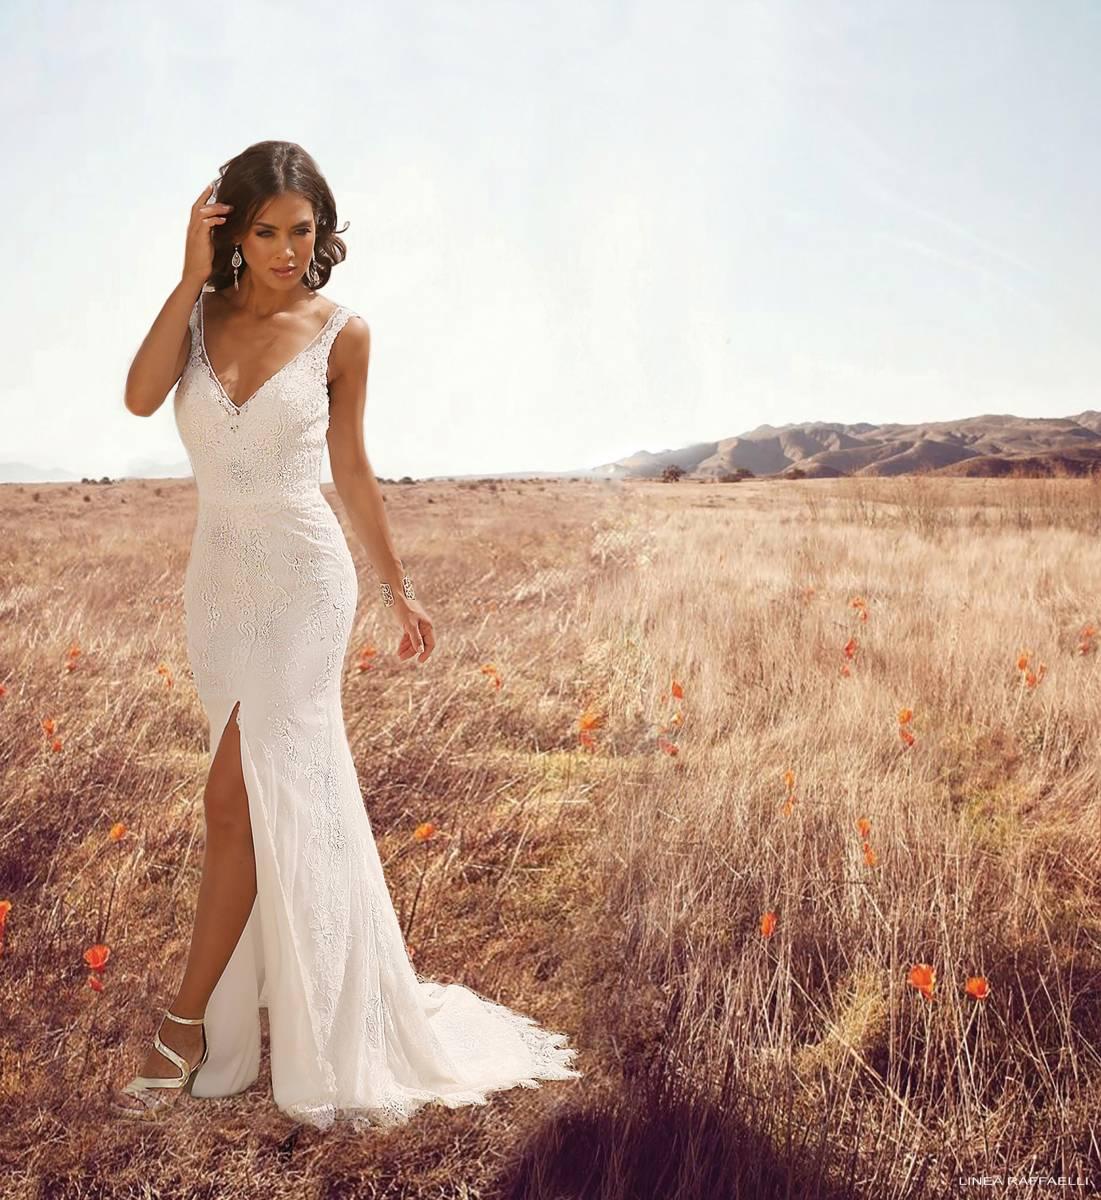 Cermo Concept - Bruidsmode winkel - Trouwjurk - Kostuum - House of Weddings - 1